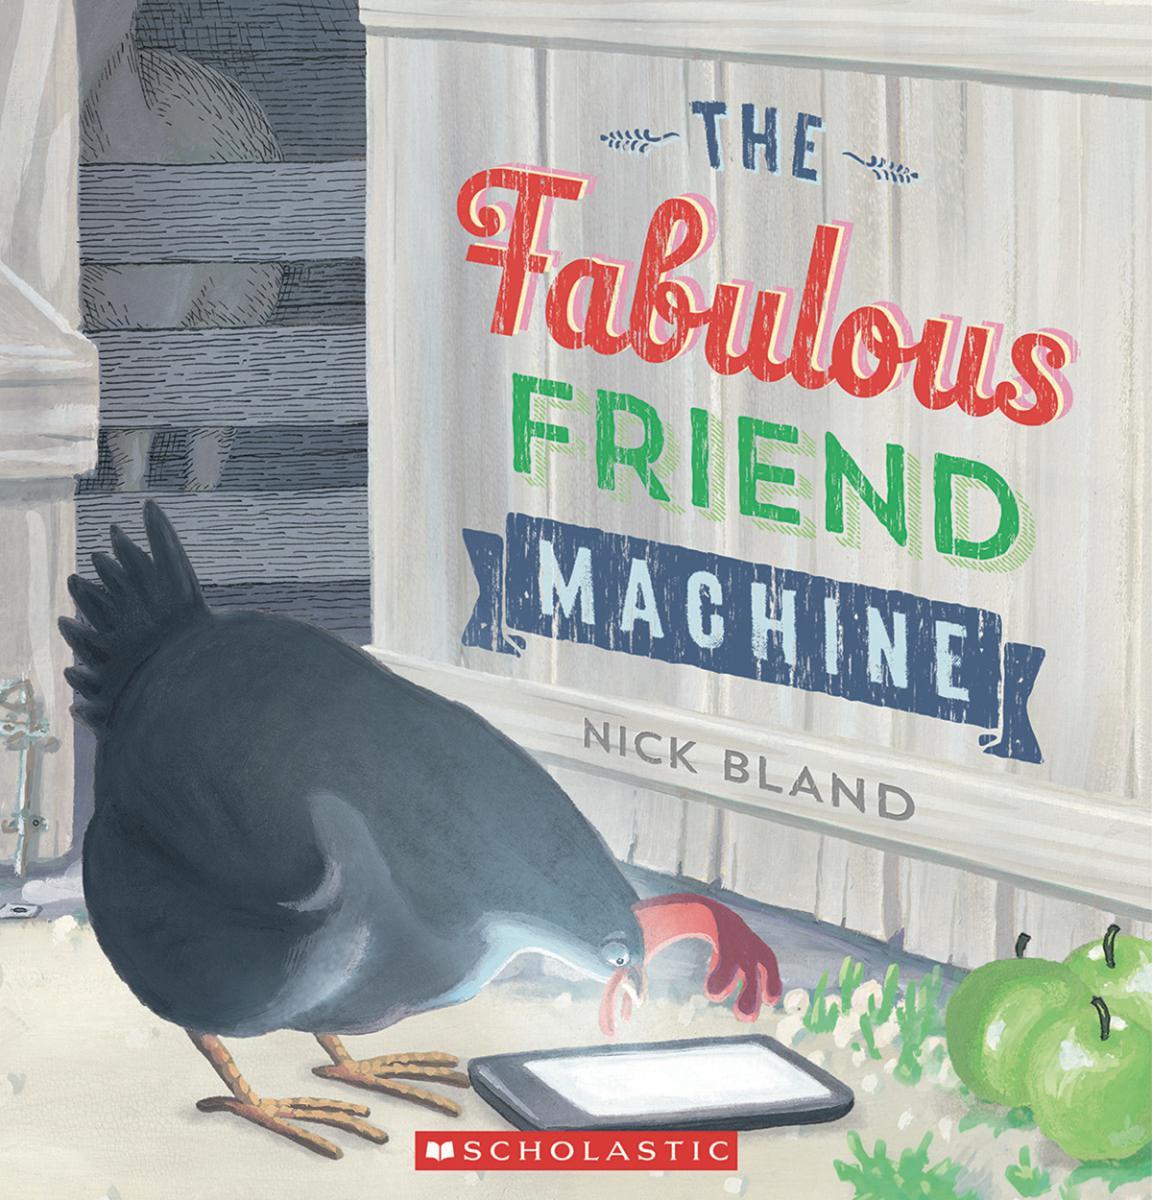 The Fabulous Friend Machine